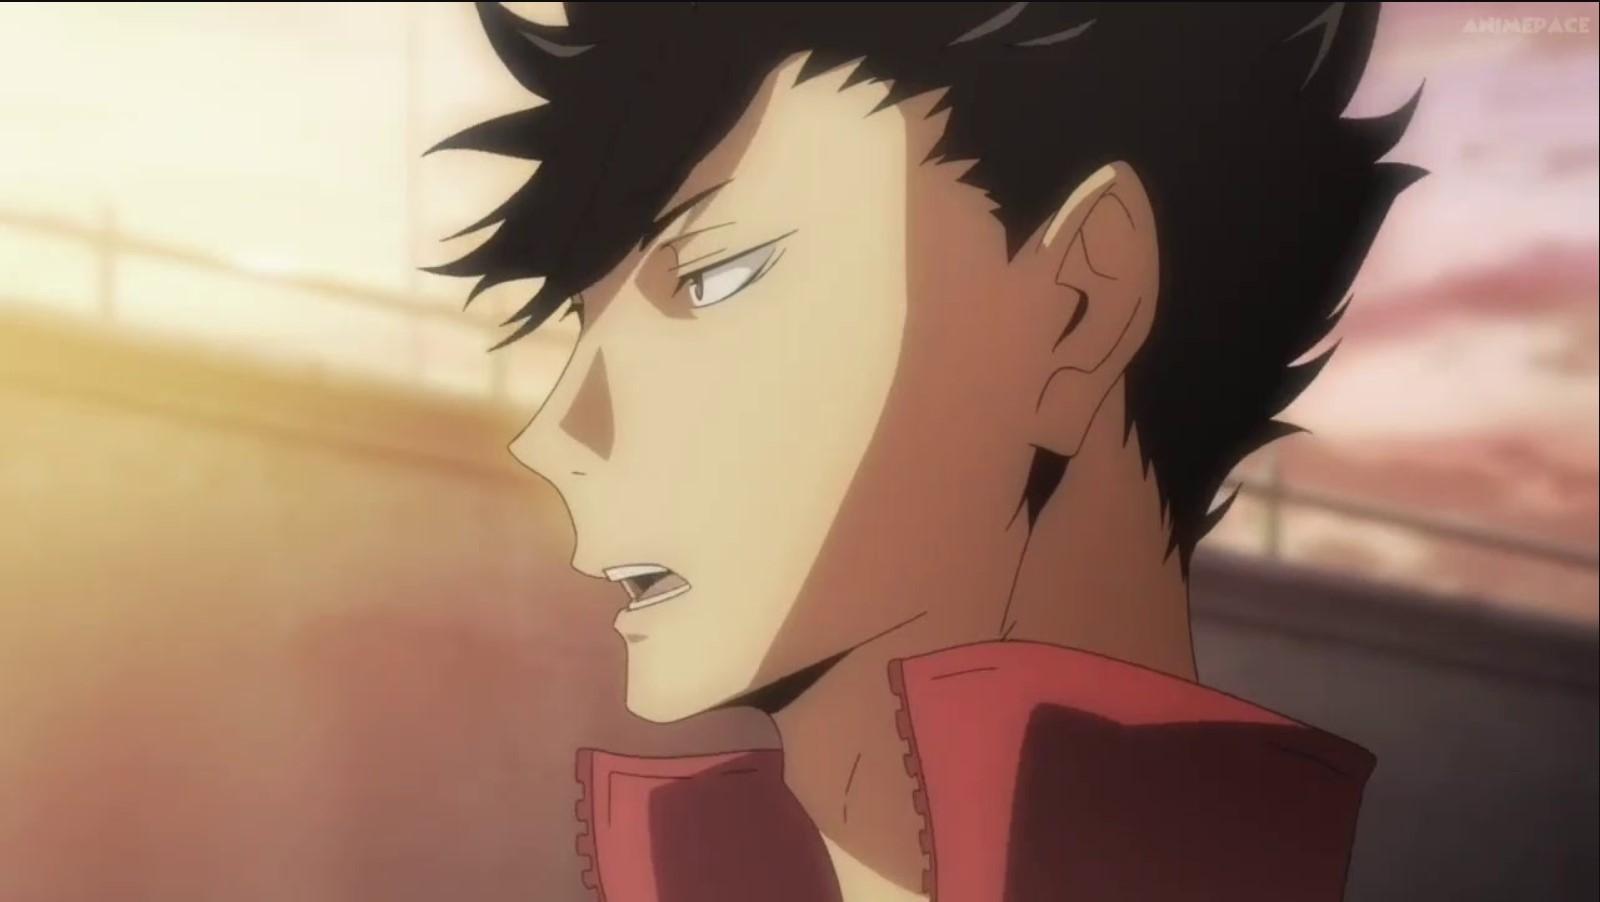 hot anime guys!